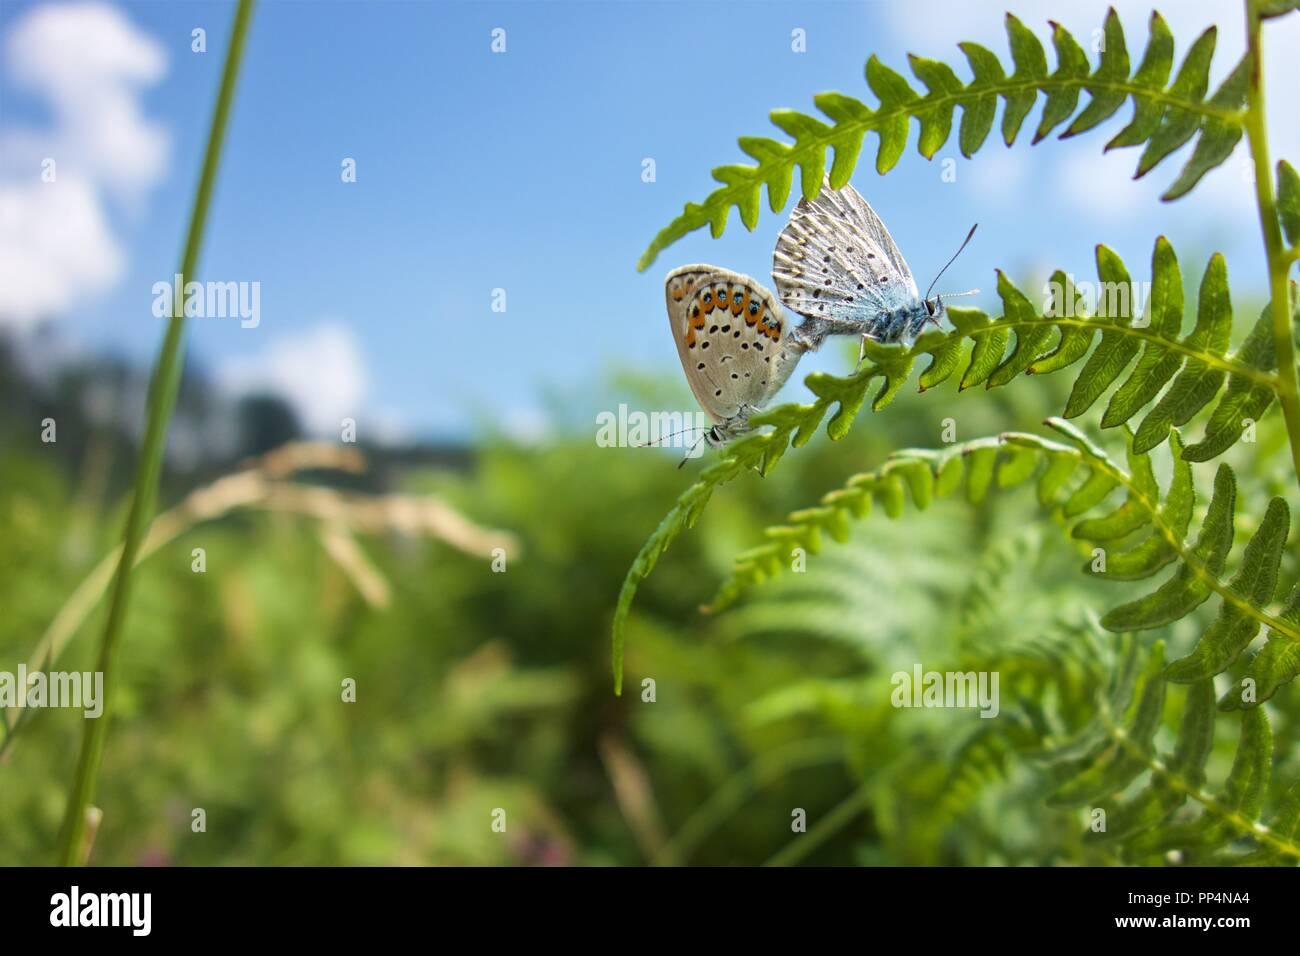 Butterflys - Stock Image